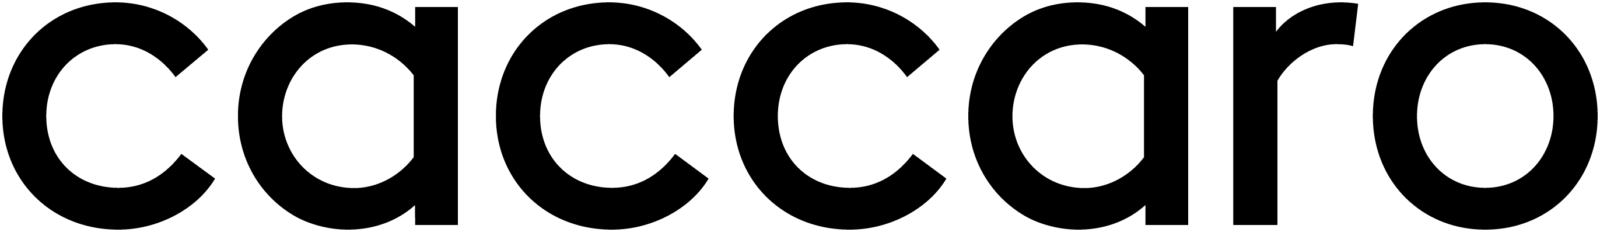 logo-caccaro